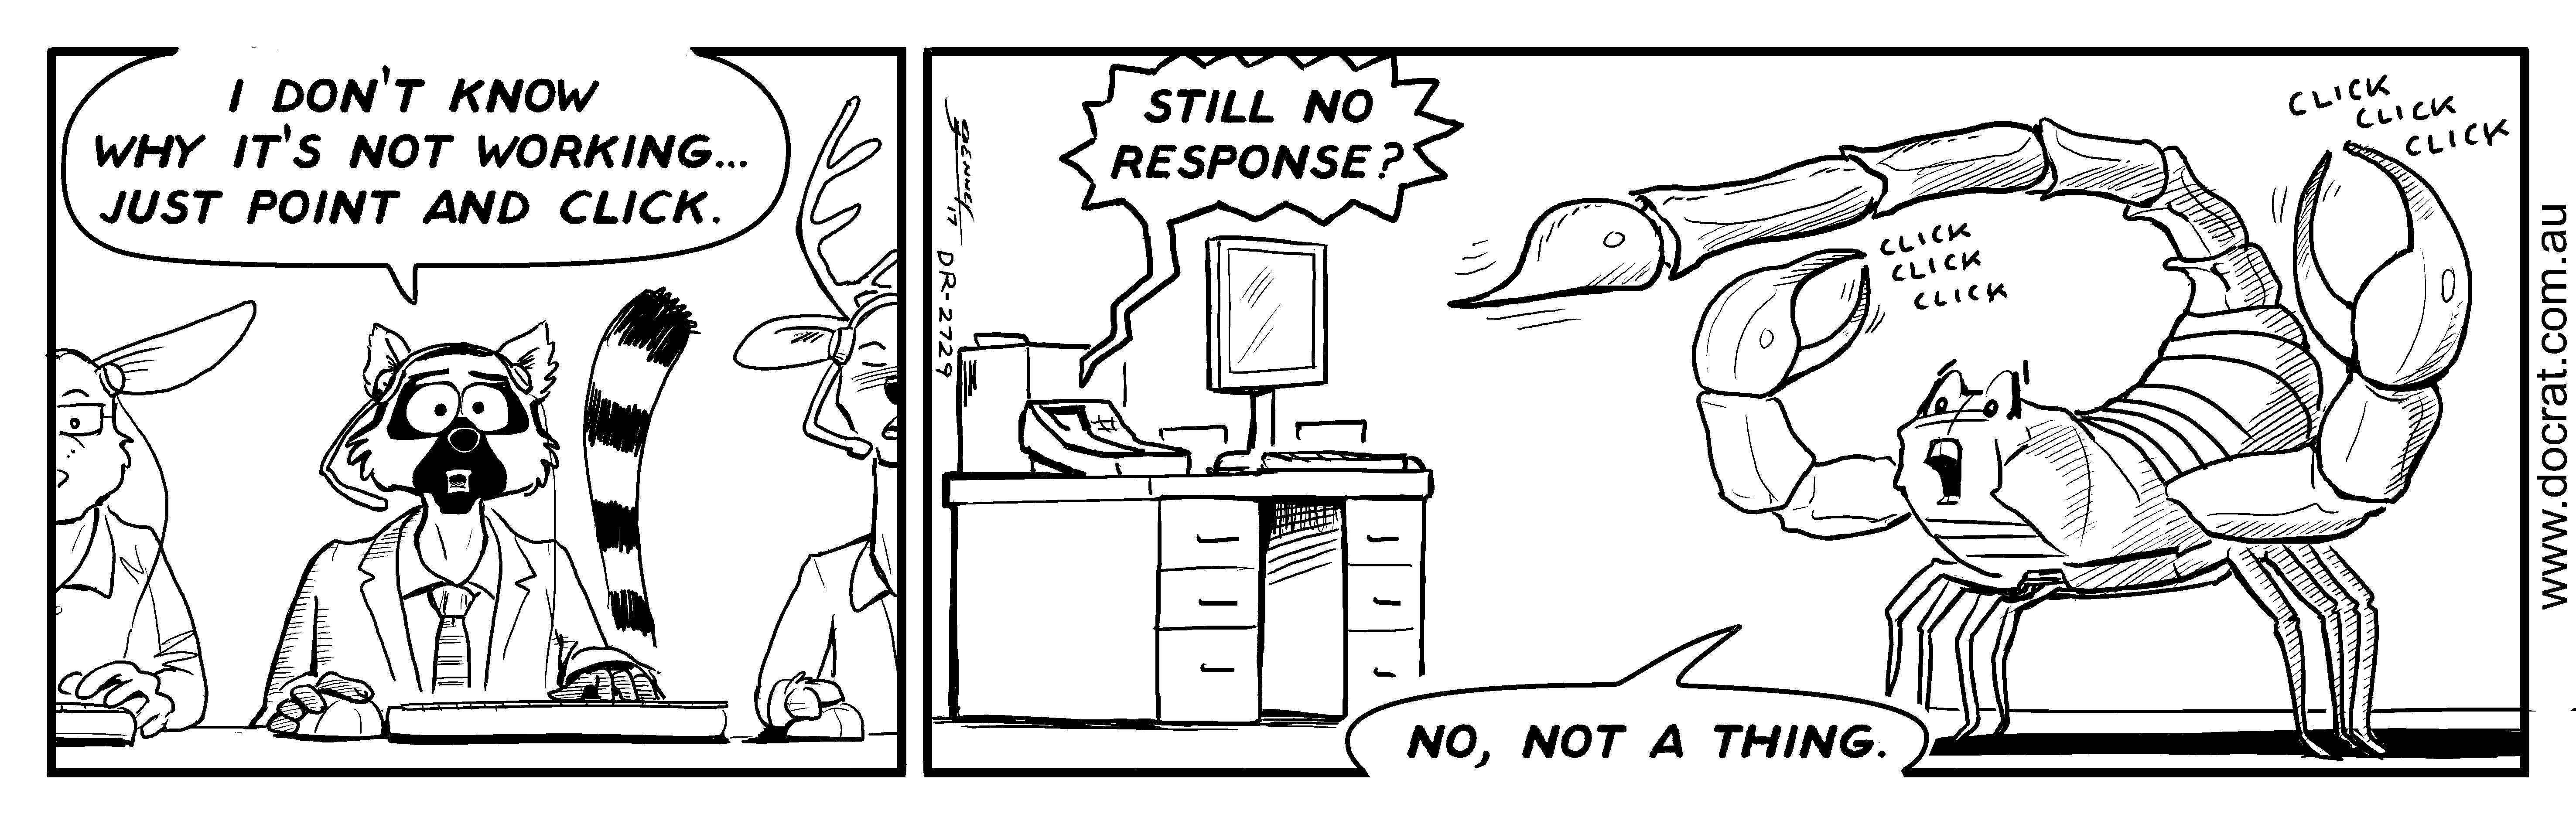 20170309